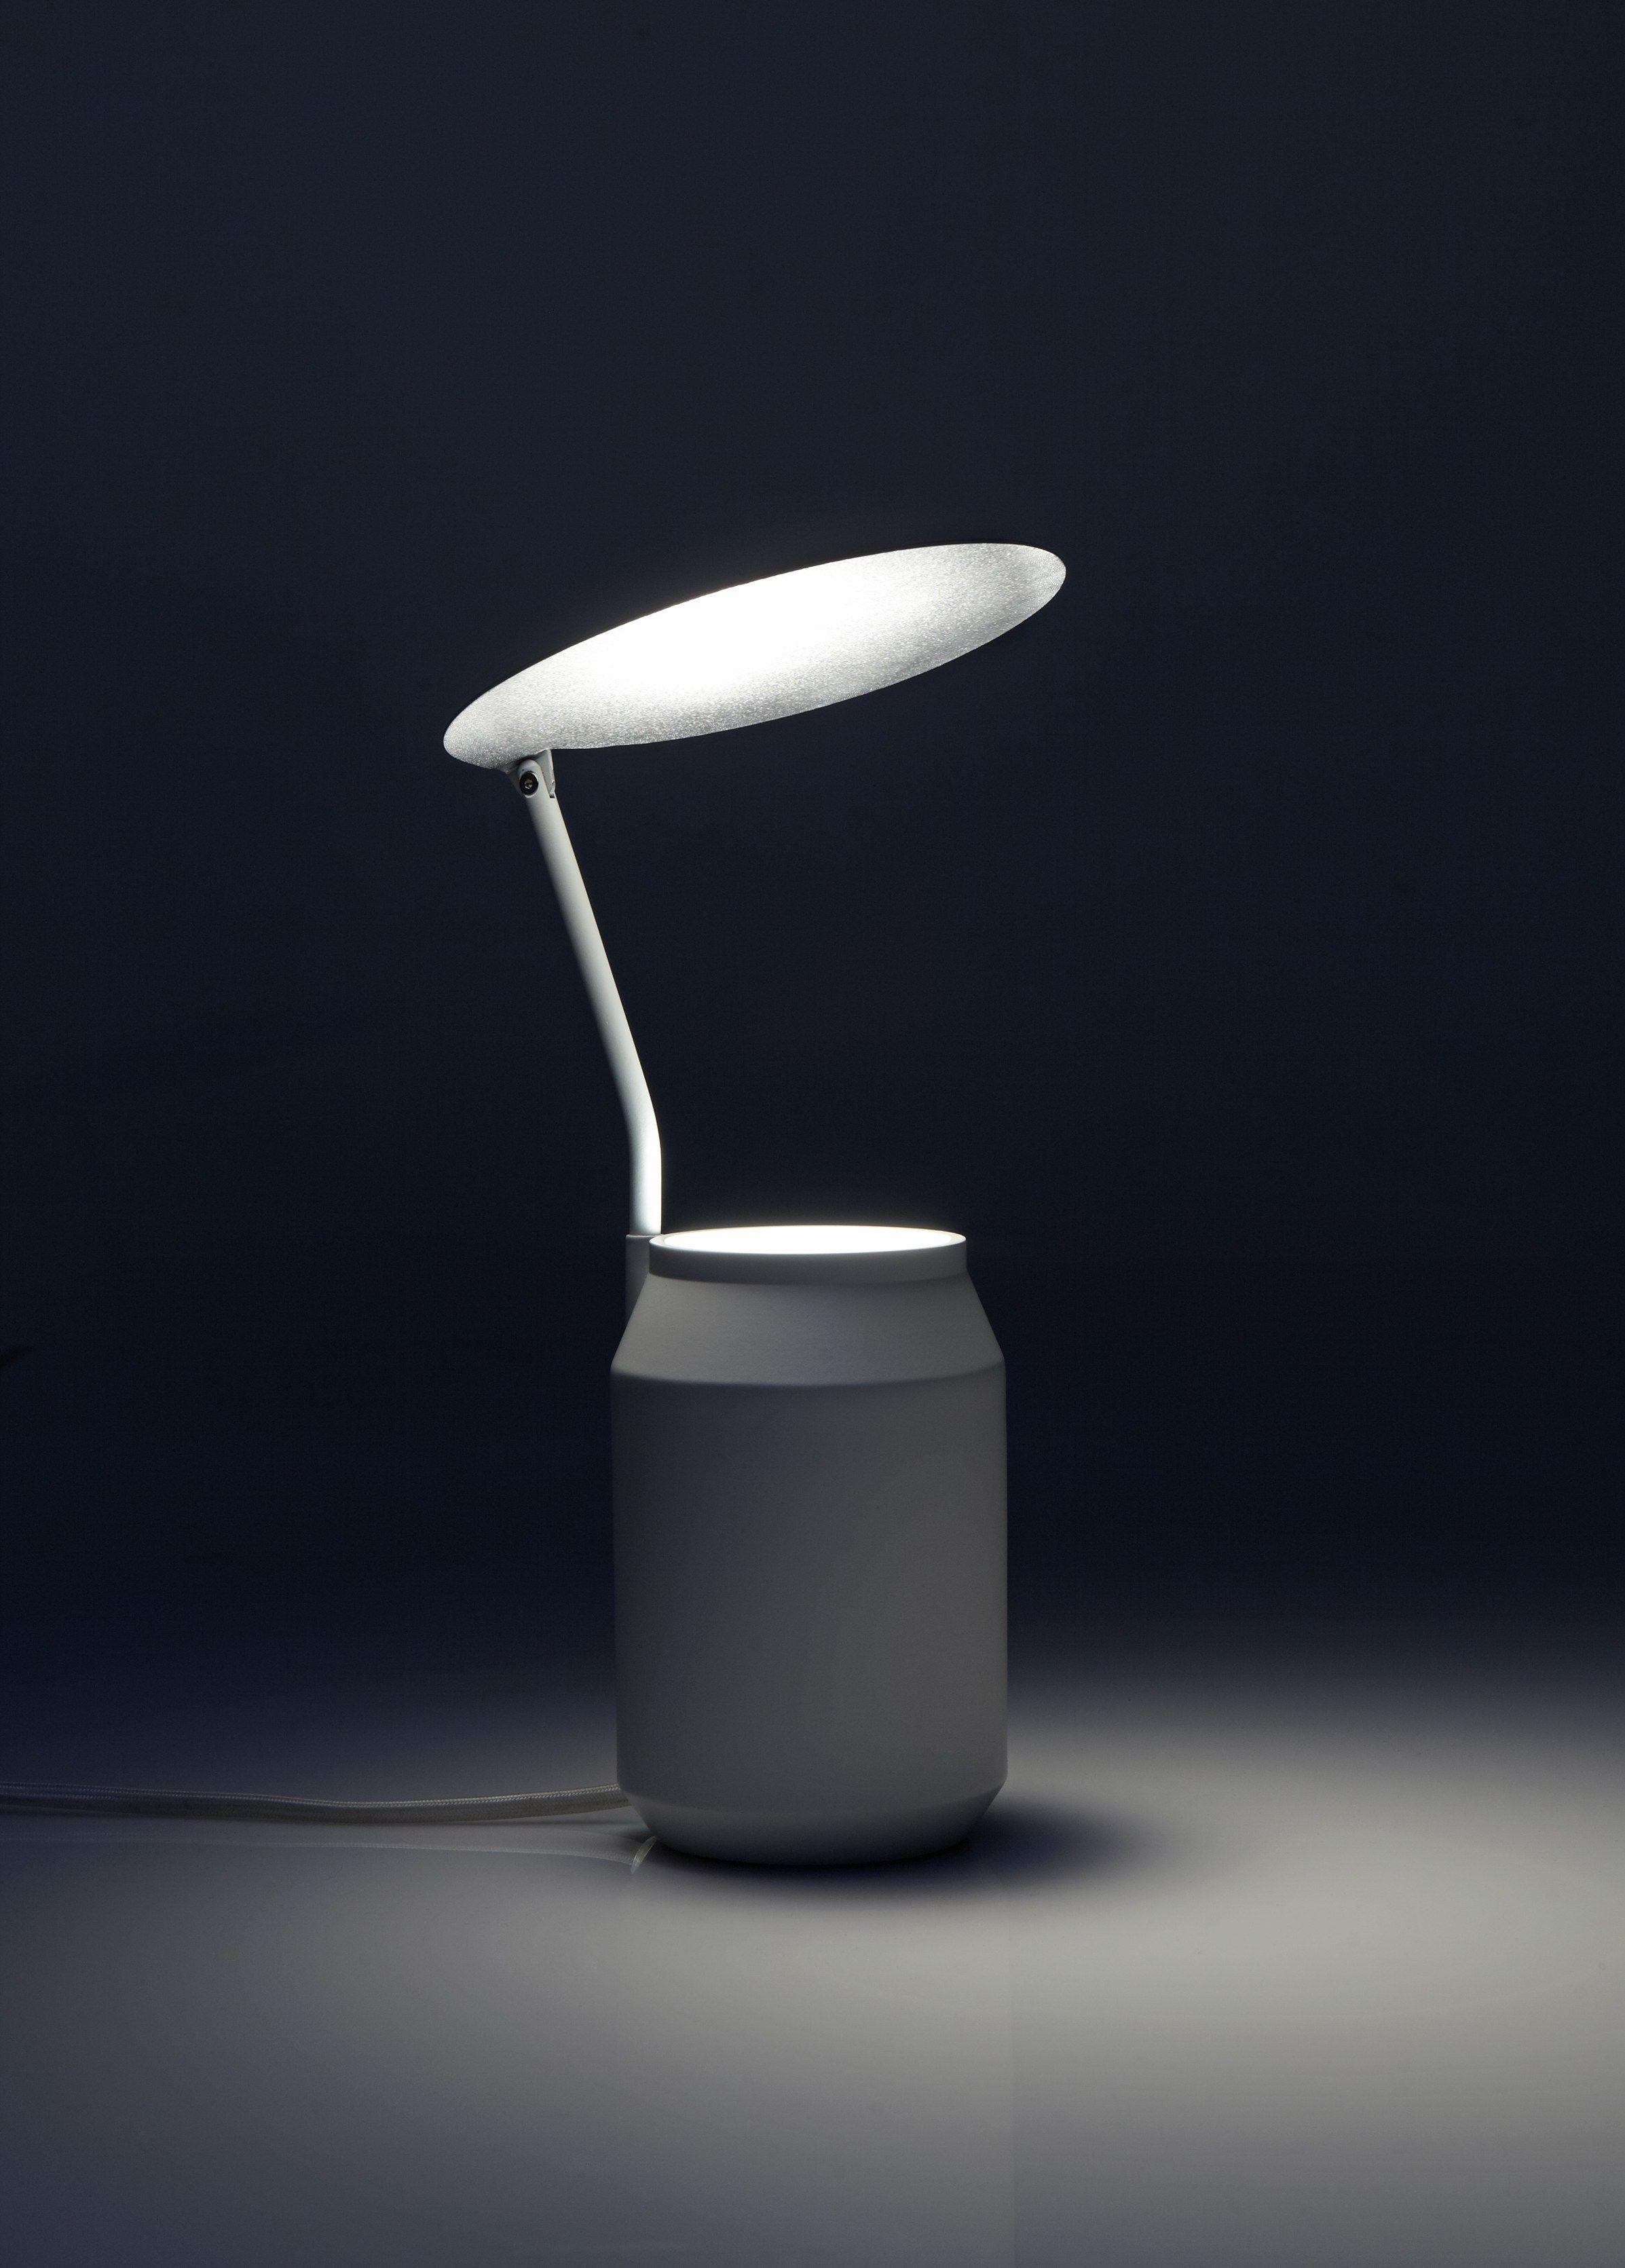 Lampe De Table Pour Clairage Indirect Lens By Forestier